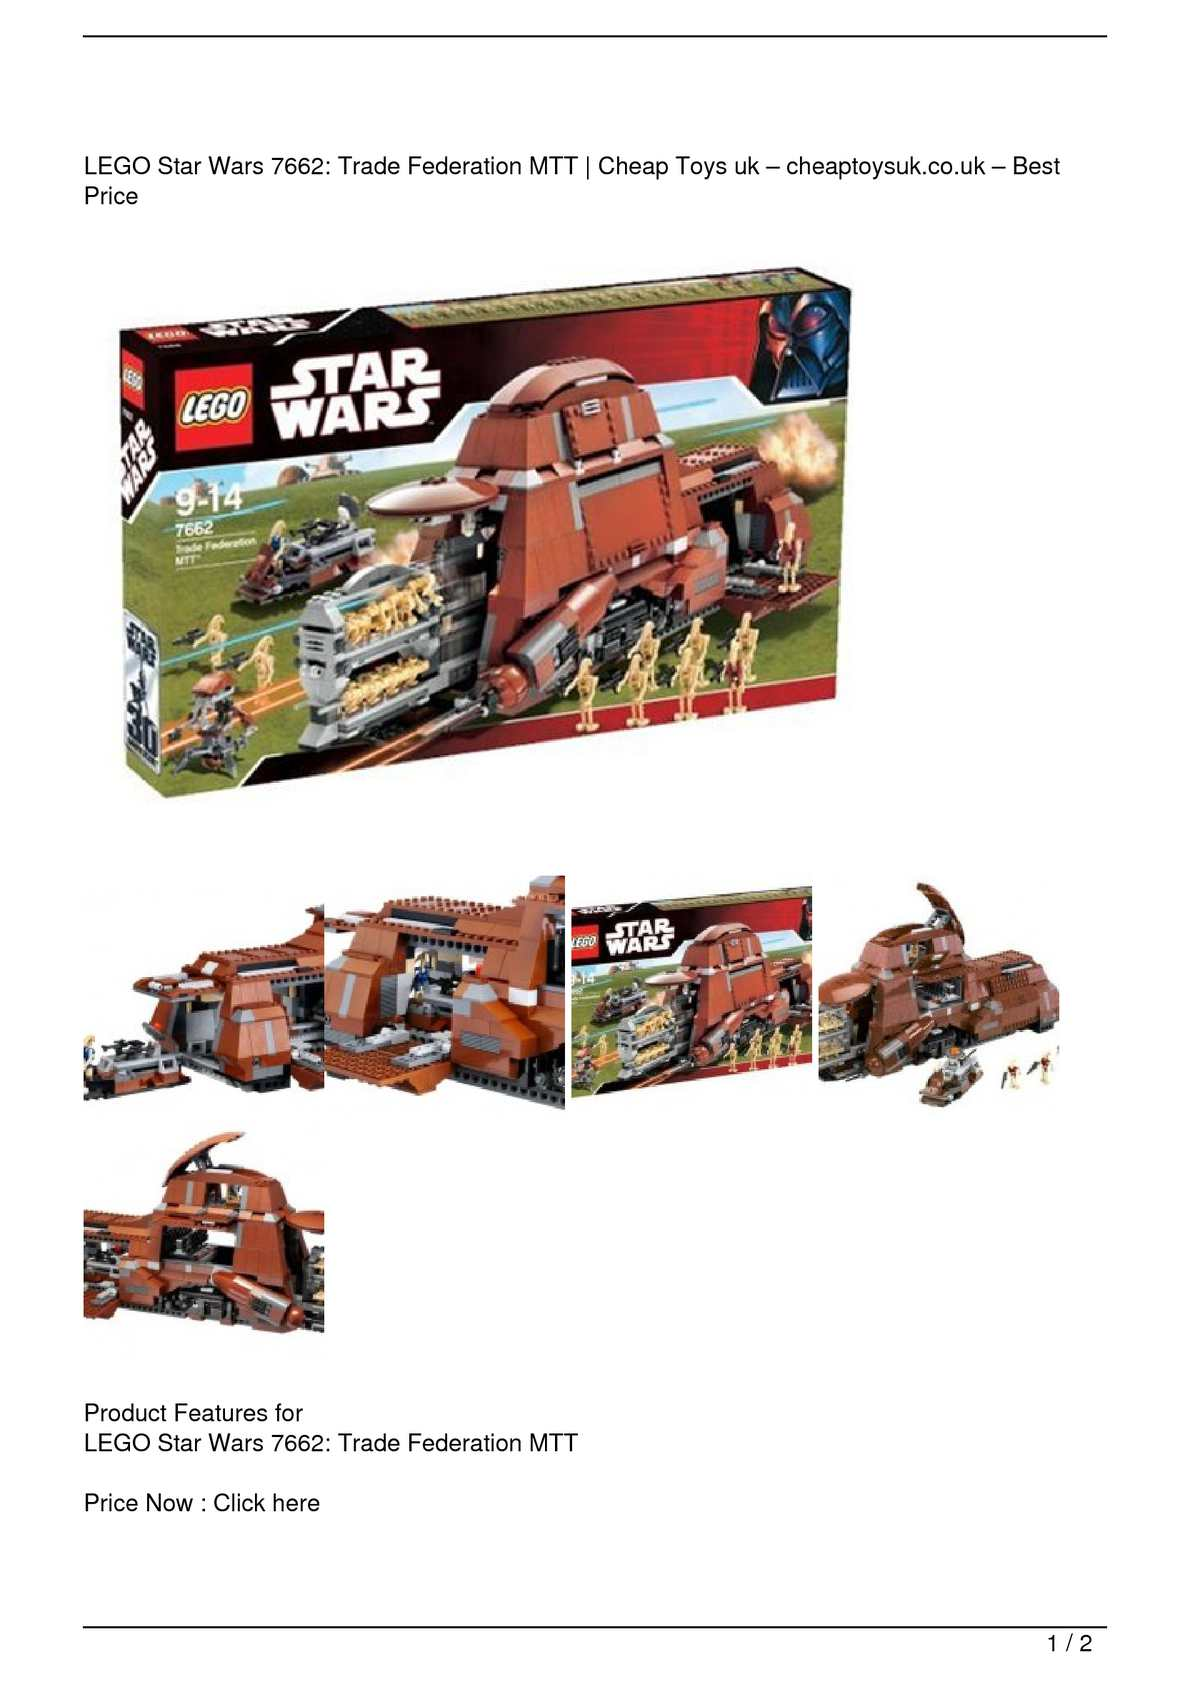 Calaméo - LEGO Star Wars 7662: Trade Federation MTT On Sale